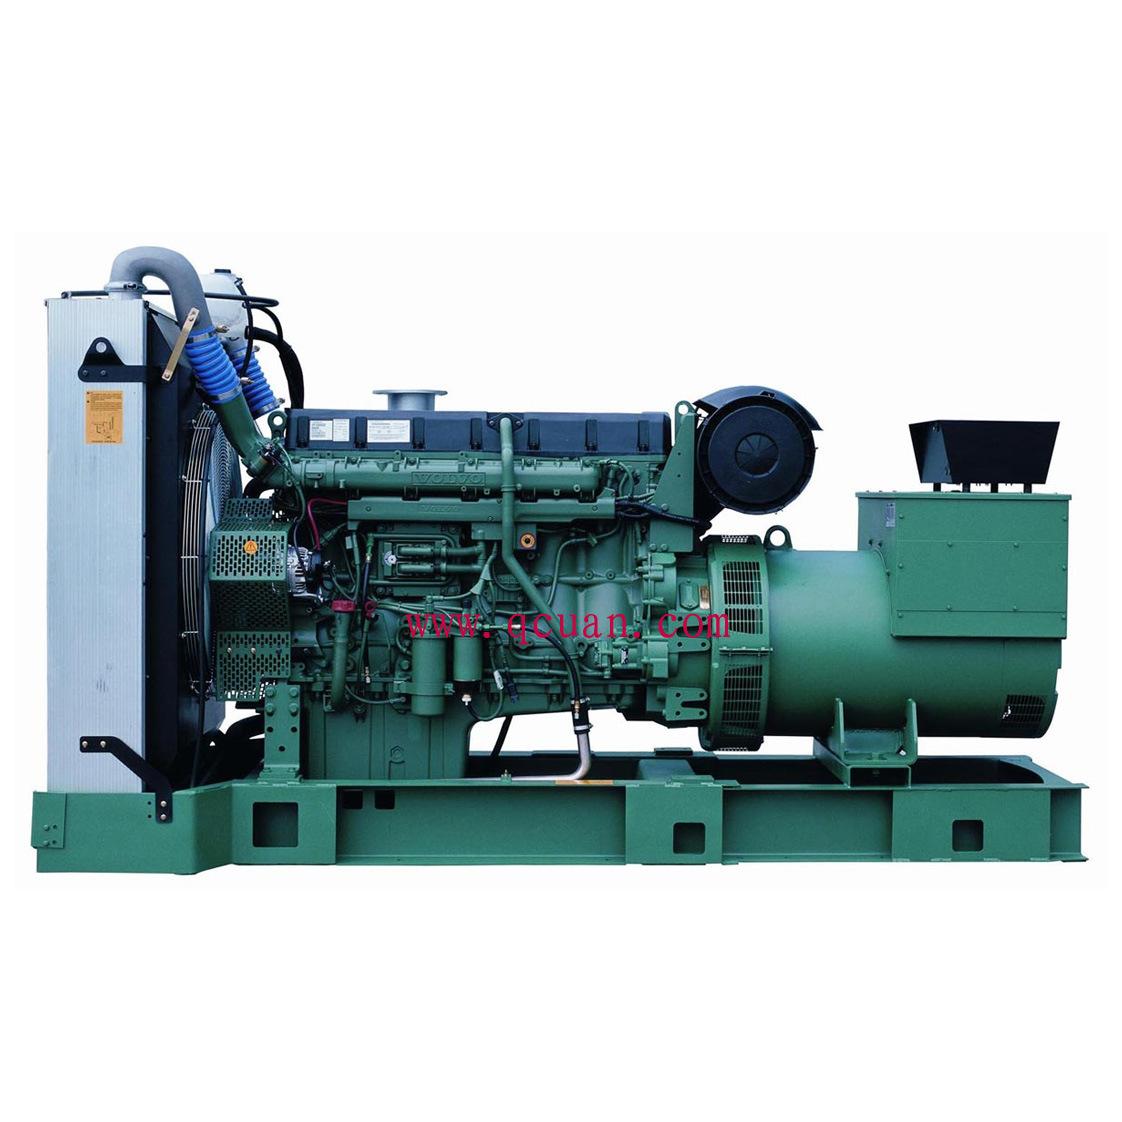 Groupe lectrog ne diesel de 410kva 330kw volvo tad1344ge groupe lectrog - Groupe electrogene triphase diesel 10 kw ...